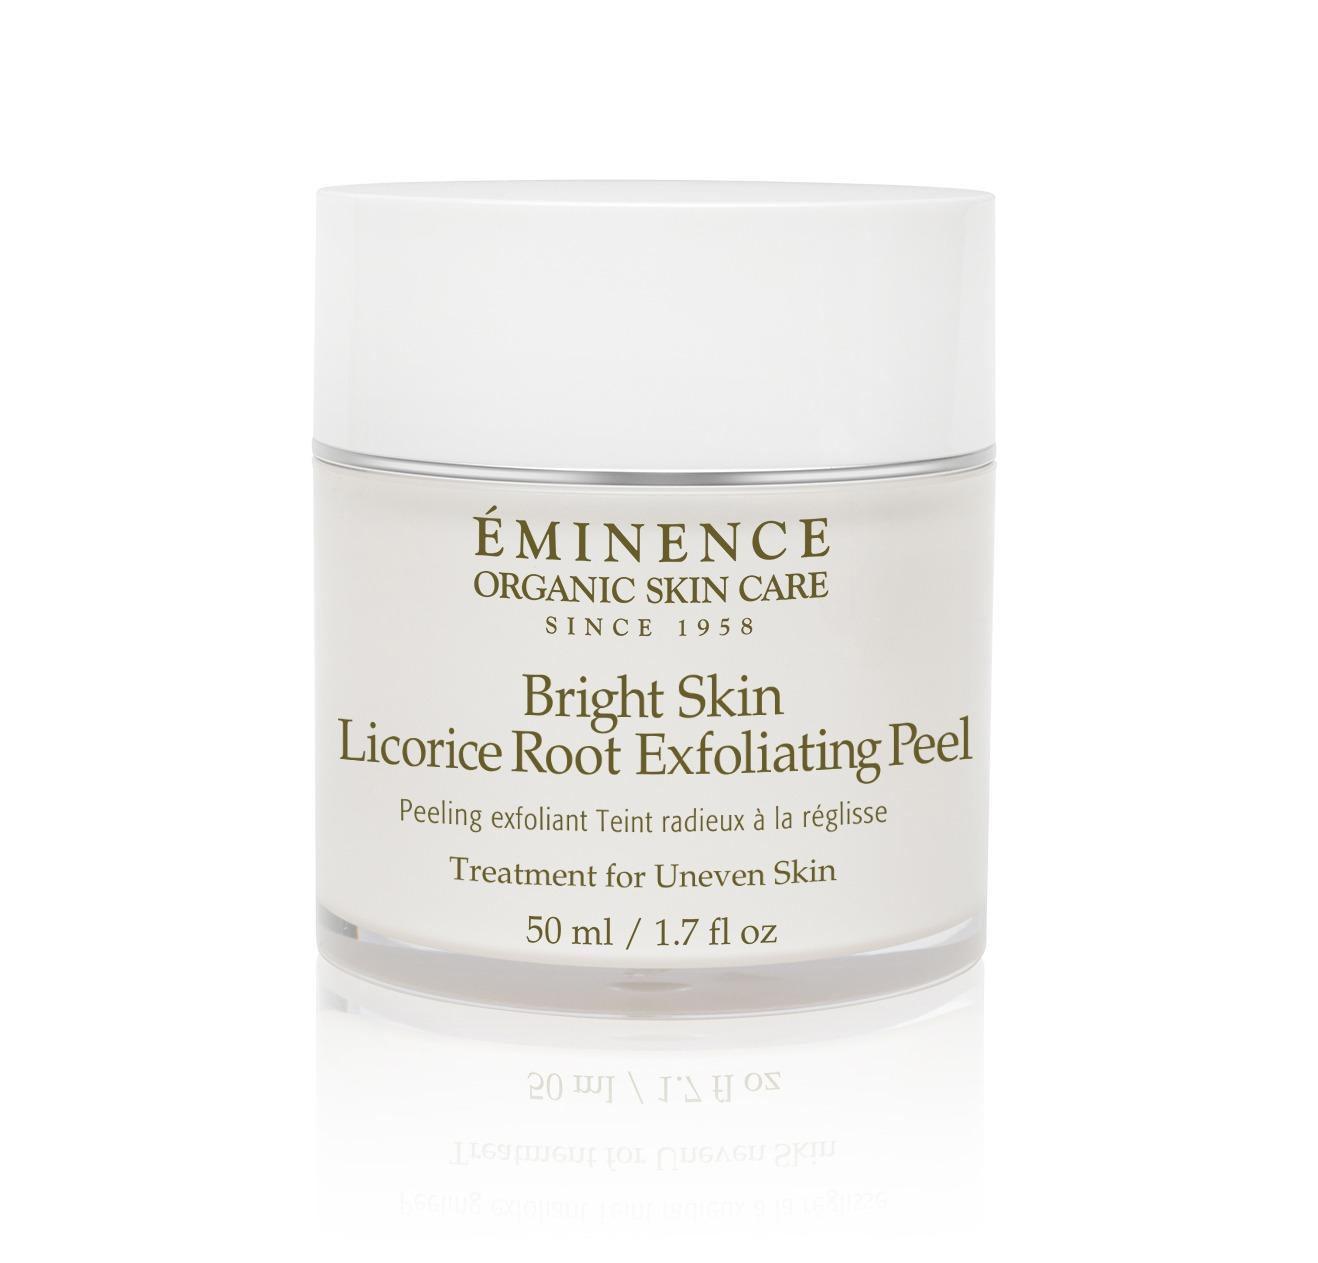 Bright Skin Licorice Root Exfoliating Peel Jessica S Apothecary